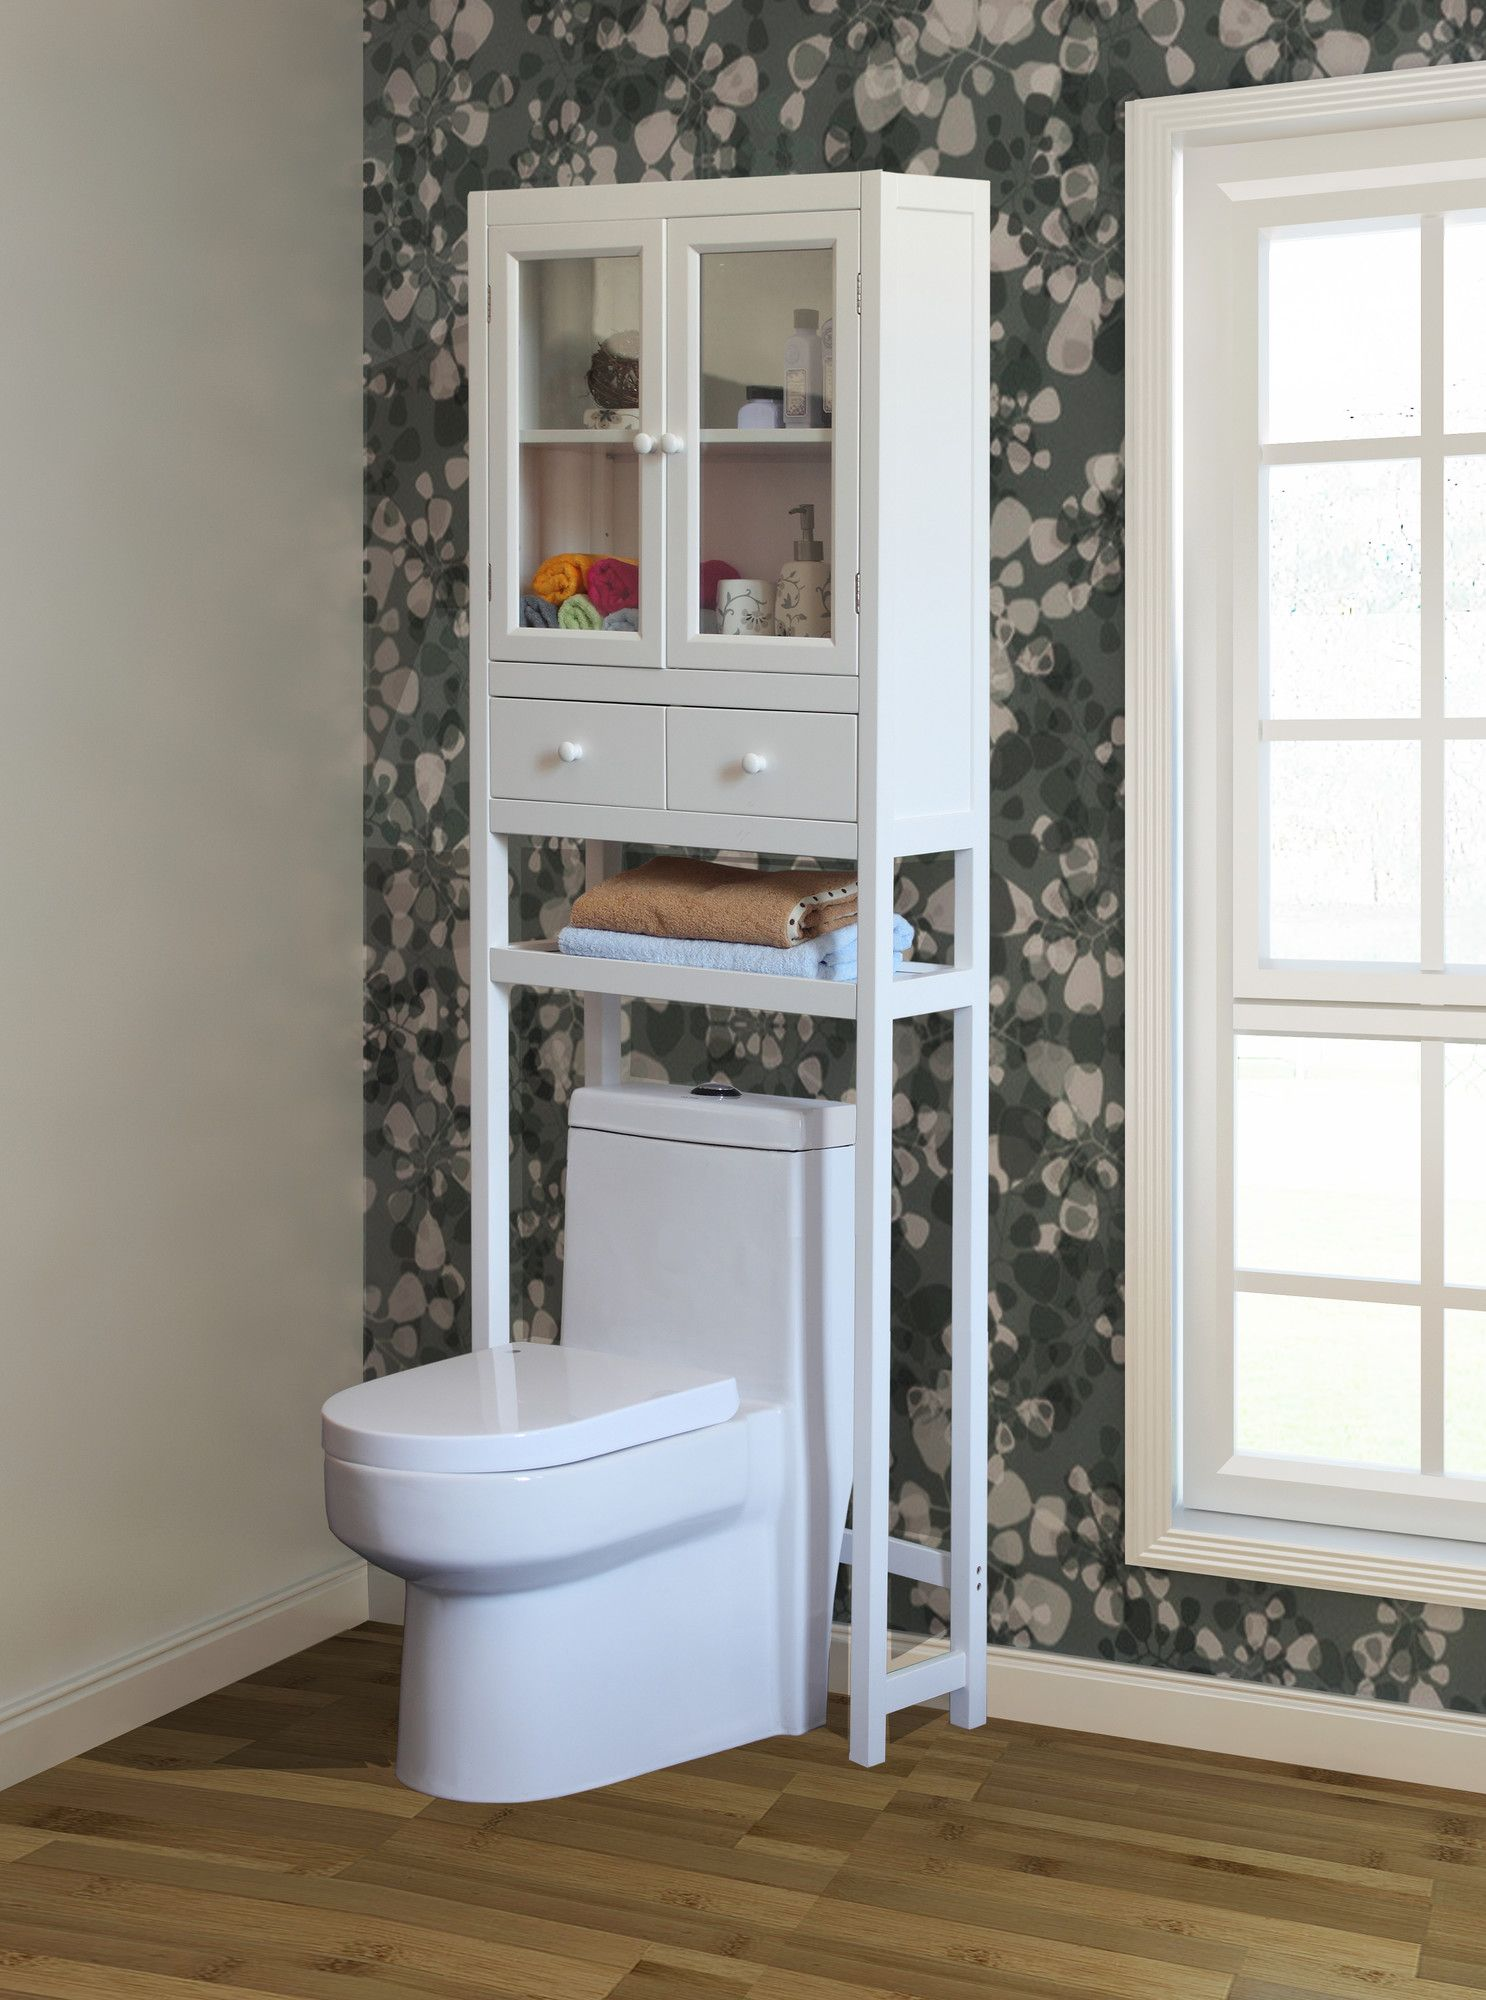 "23.6"" W x 70.8"" H Over the Toilet Storage Over toilet"